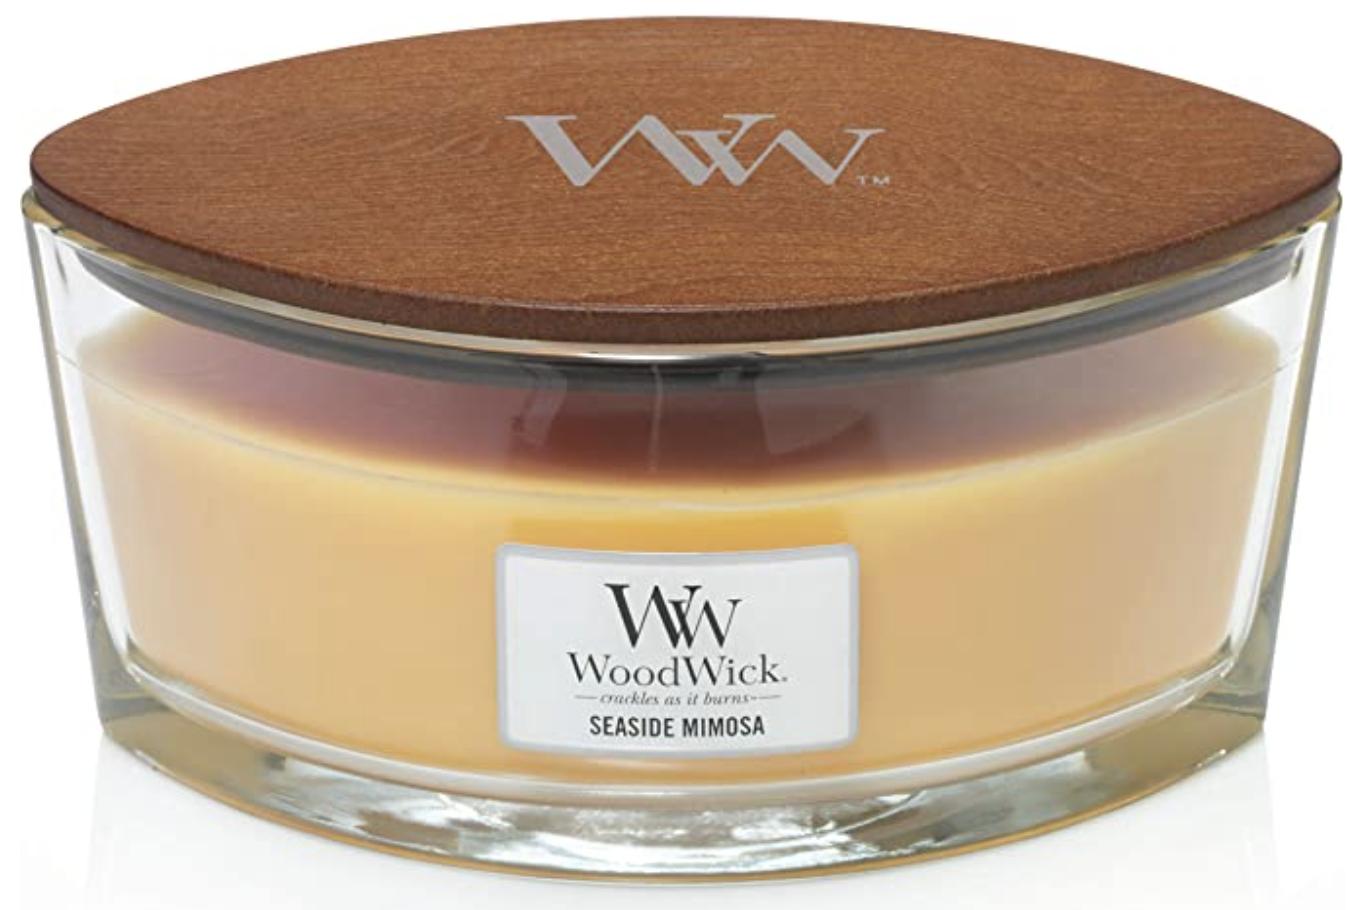 Seaside Mimosa Woodwick candle